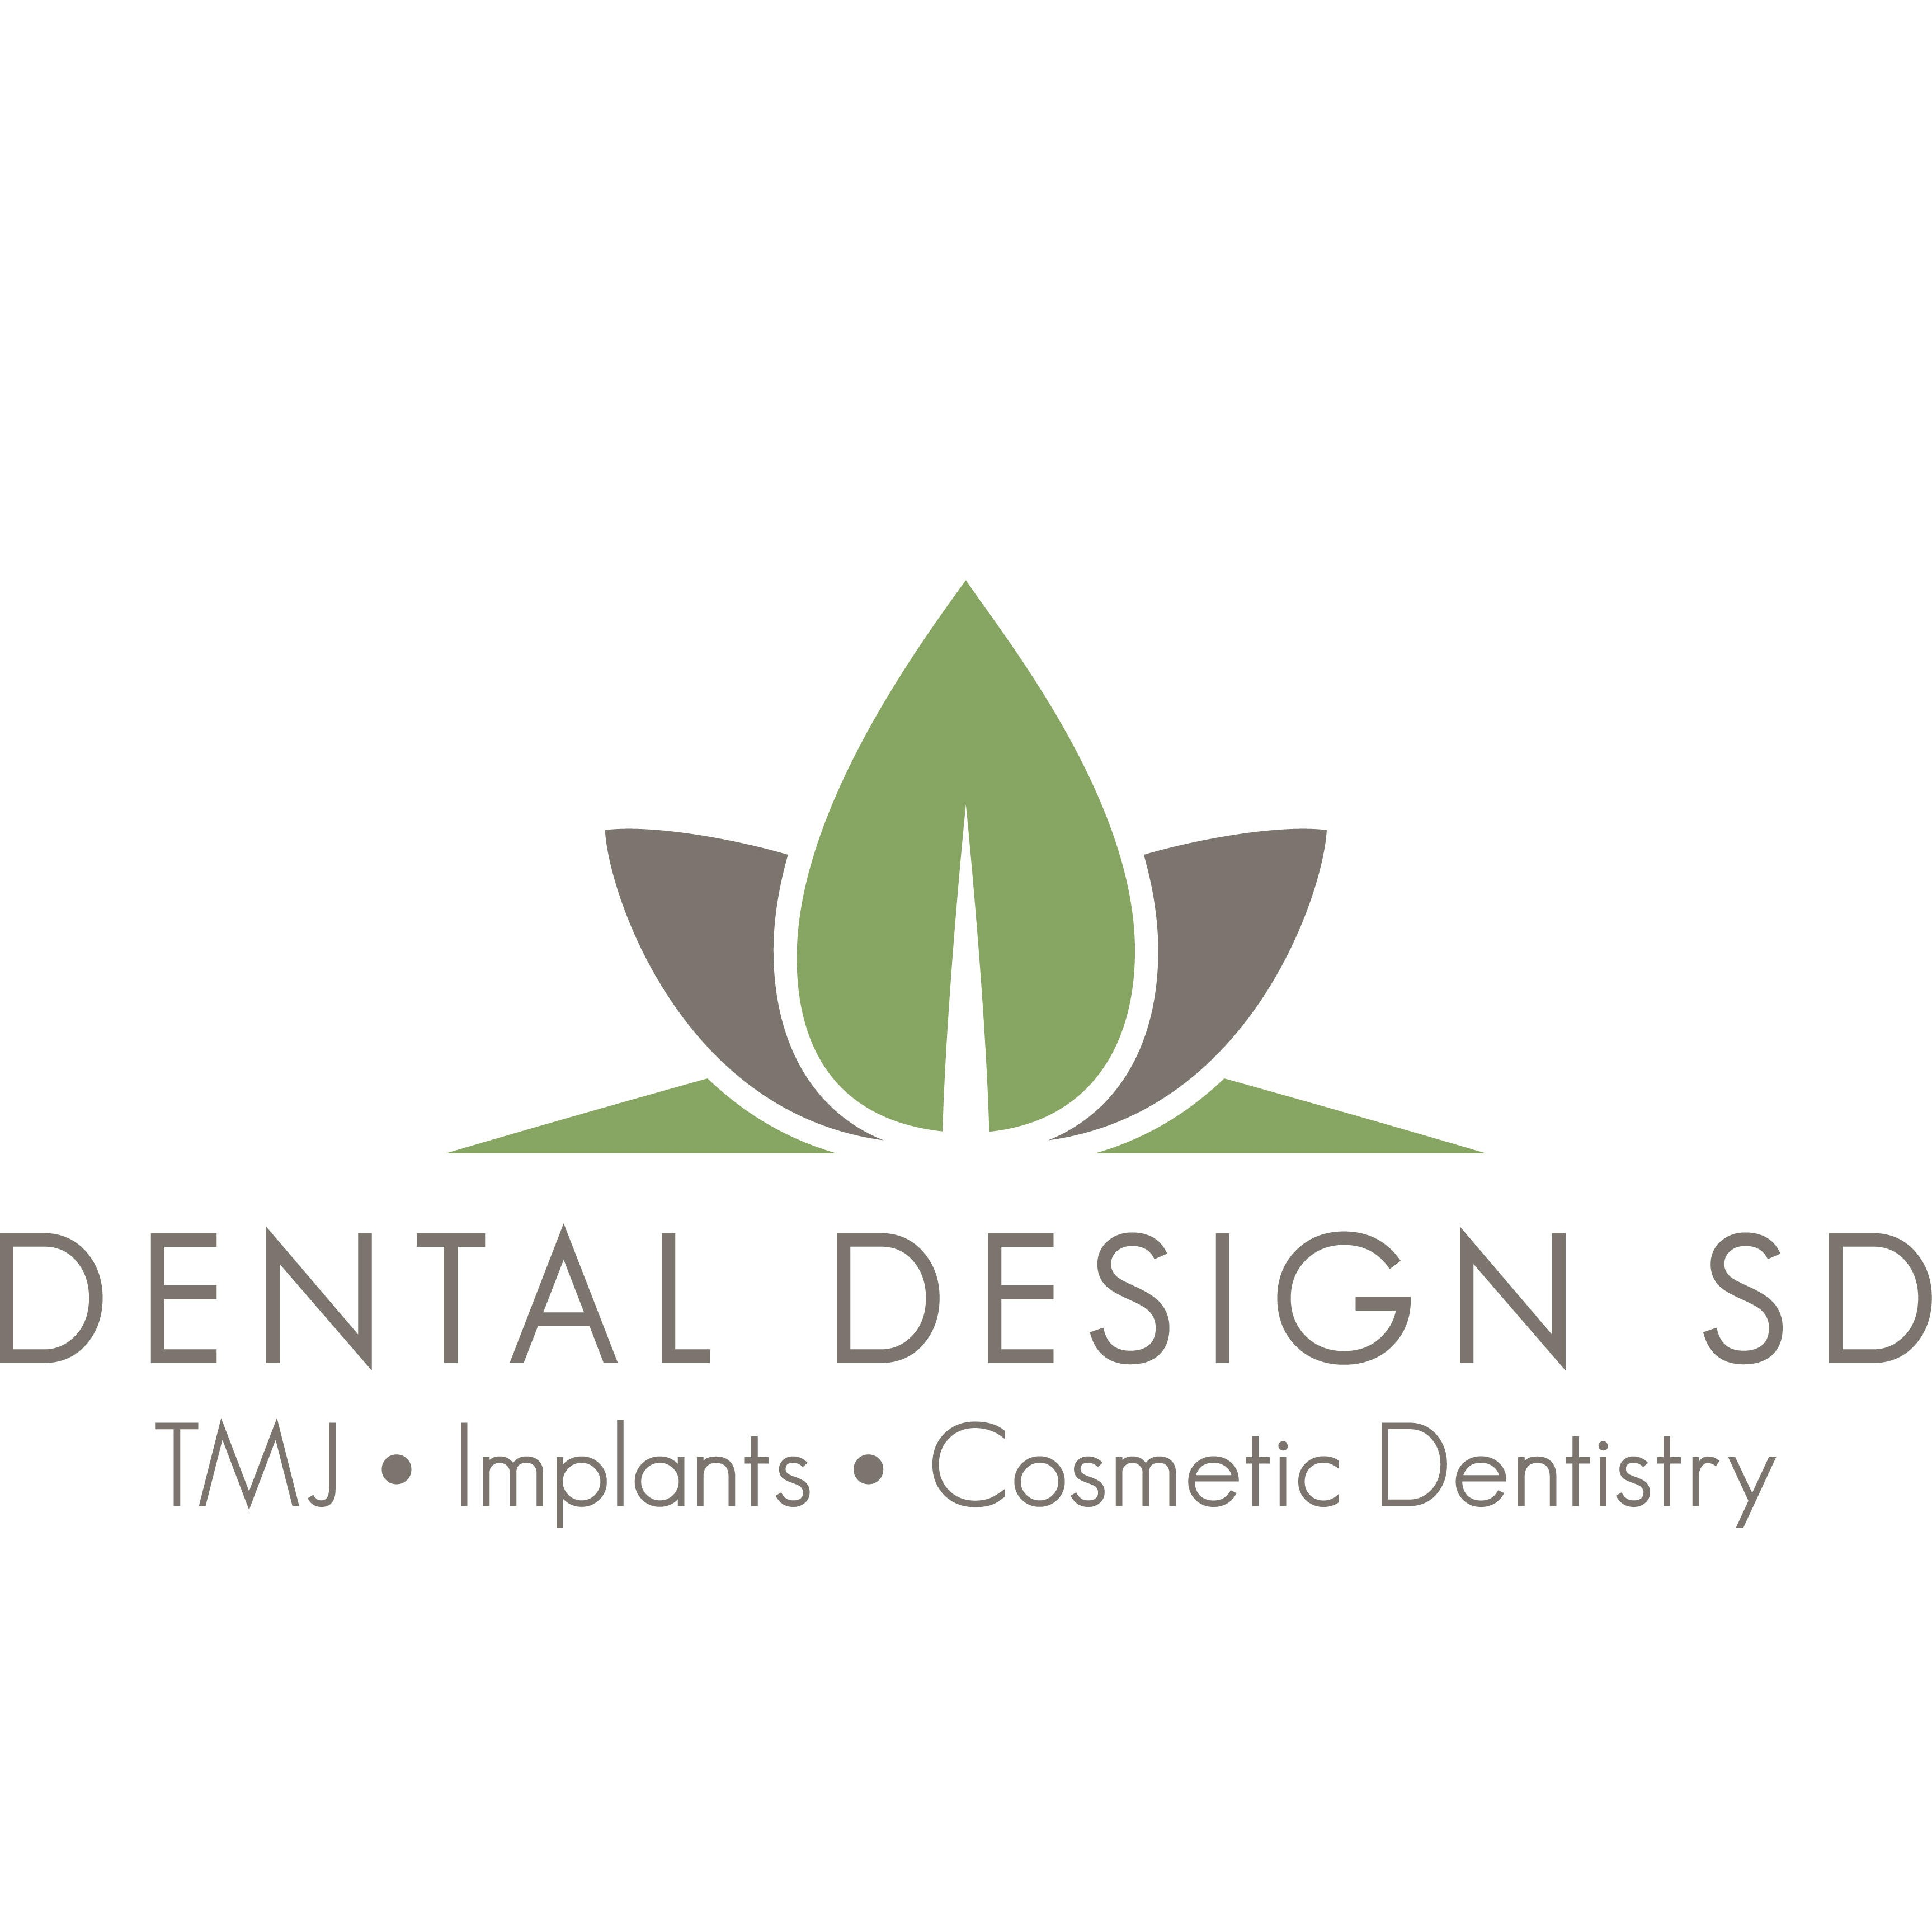 Dental Design SD